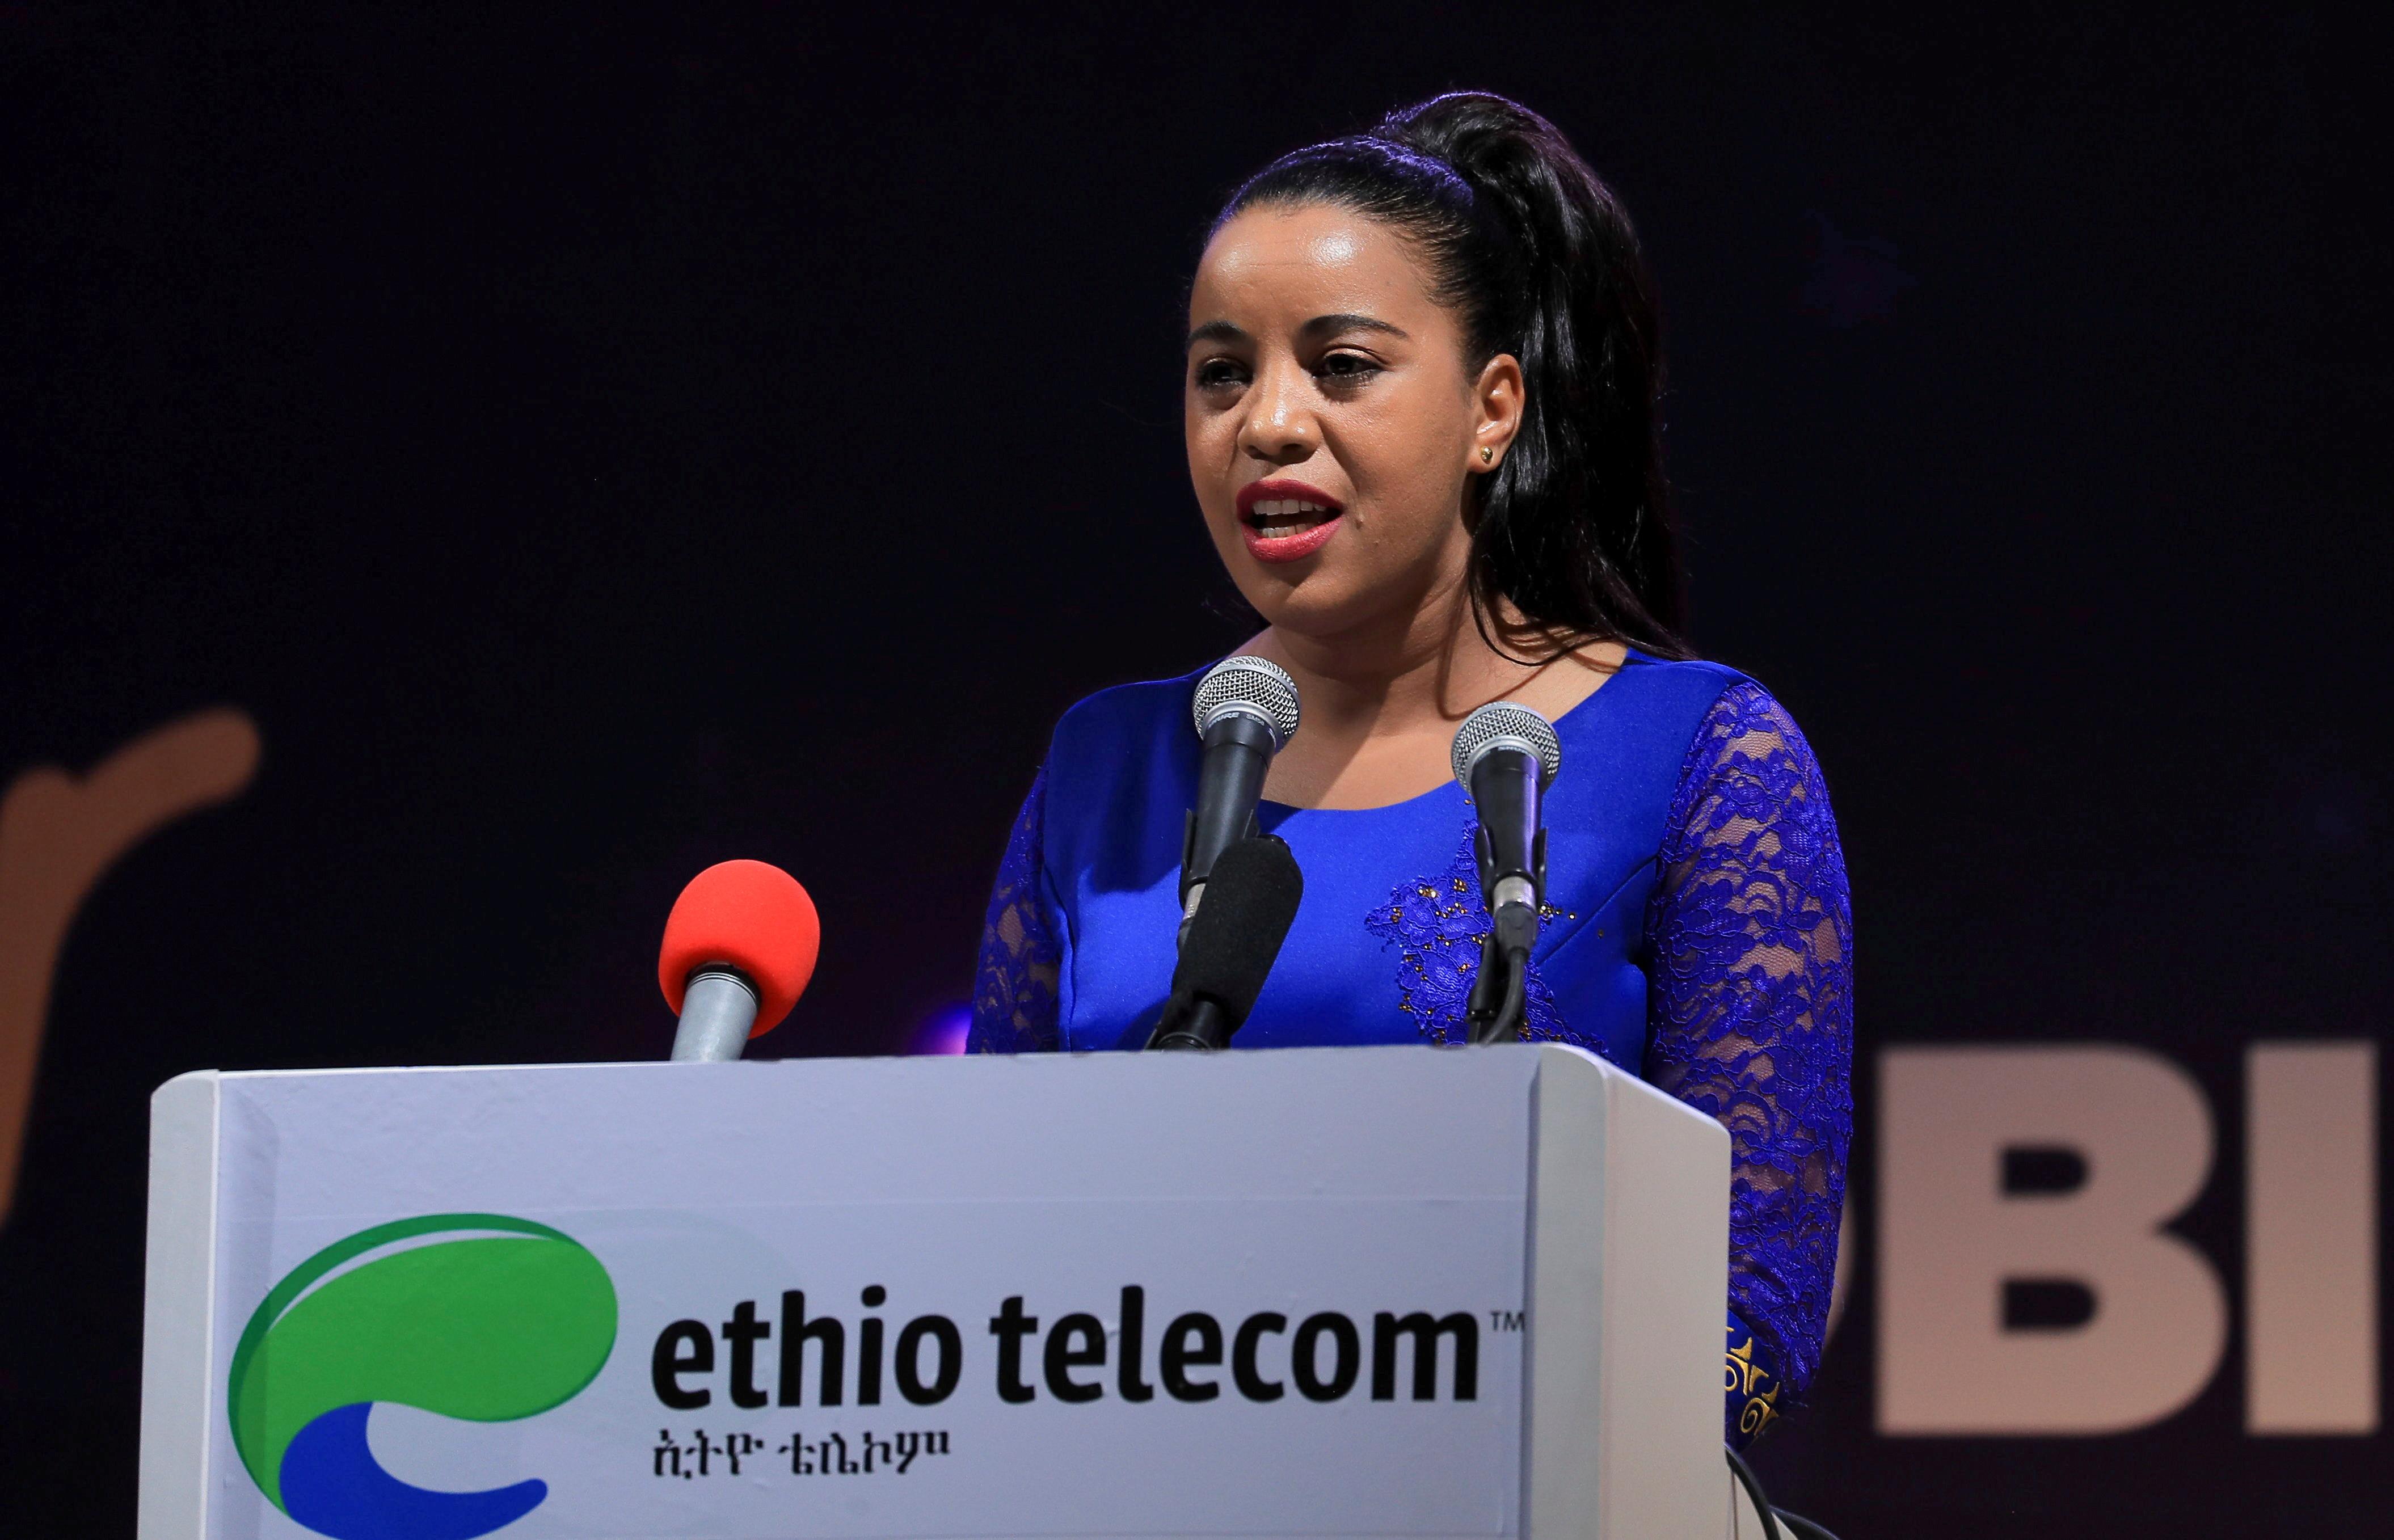 Ethio Telecom CEO Frehiwot Tamiru addresses delegates at the launch of the company's mobile money service Telebirr in Addis Ababa, Ethiopia May 11, 2021. REUTERS/Tiksa Negeri/File Photo